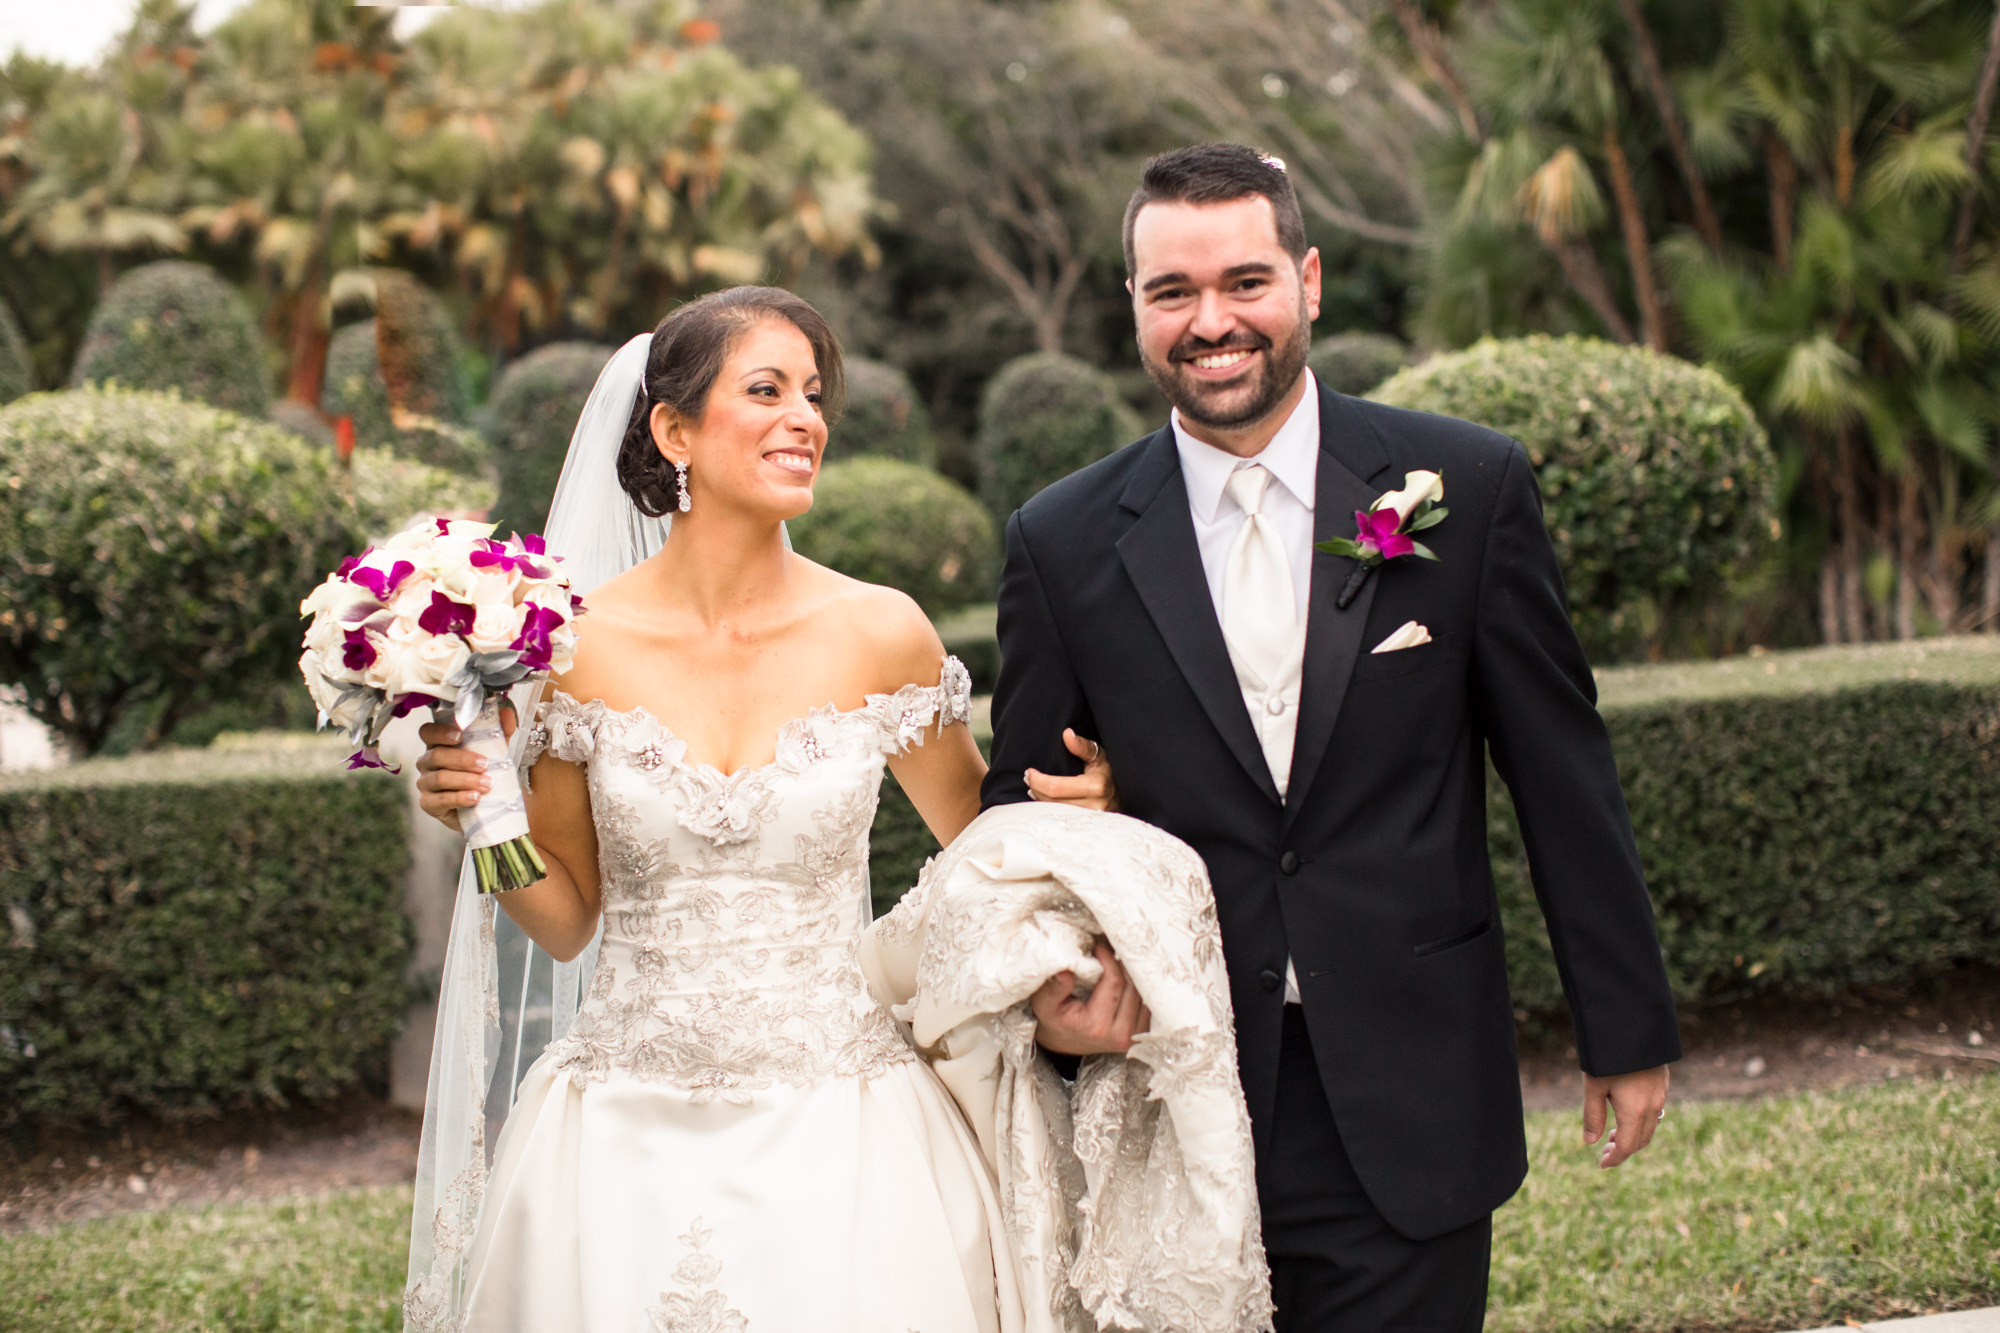 Benvenuto_Wedding_catholic_Florida_Bride-Groom-83.jpg